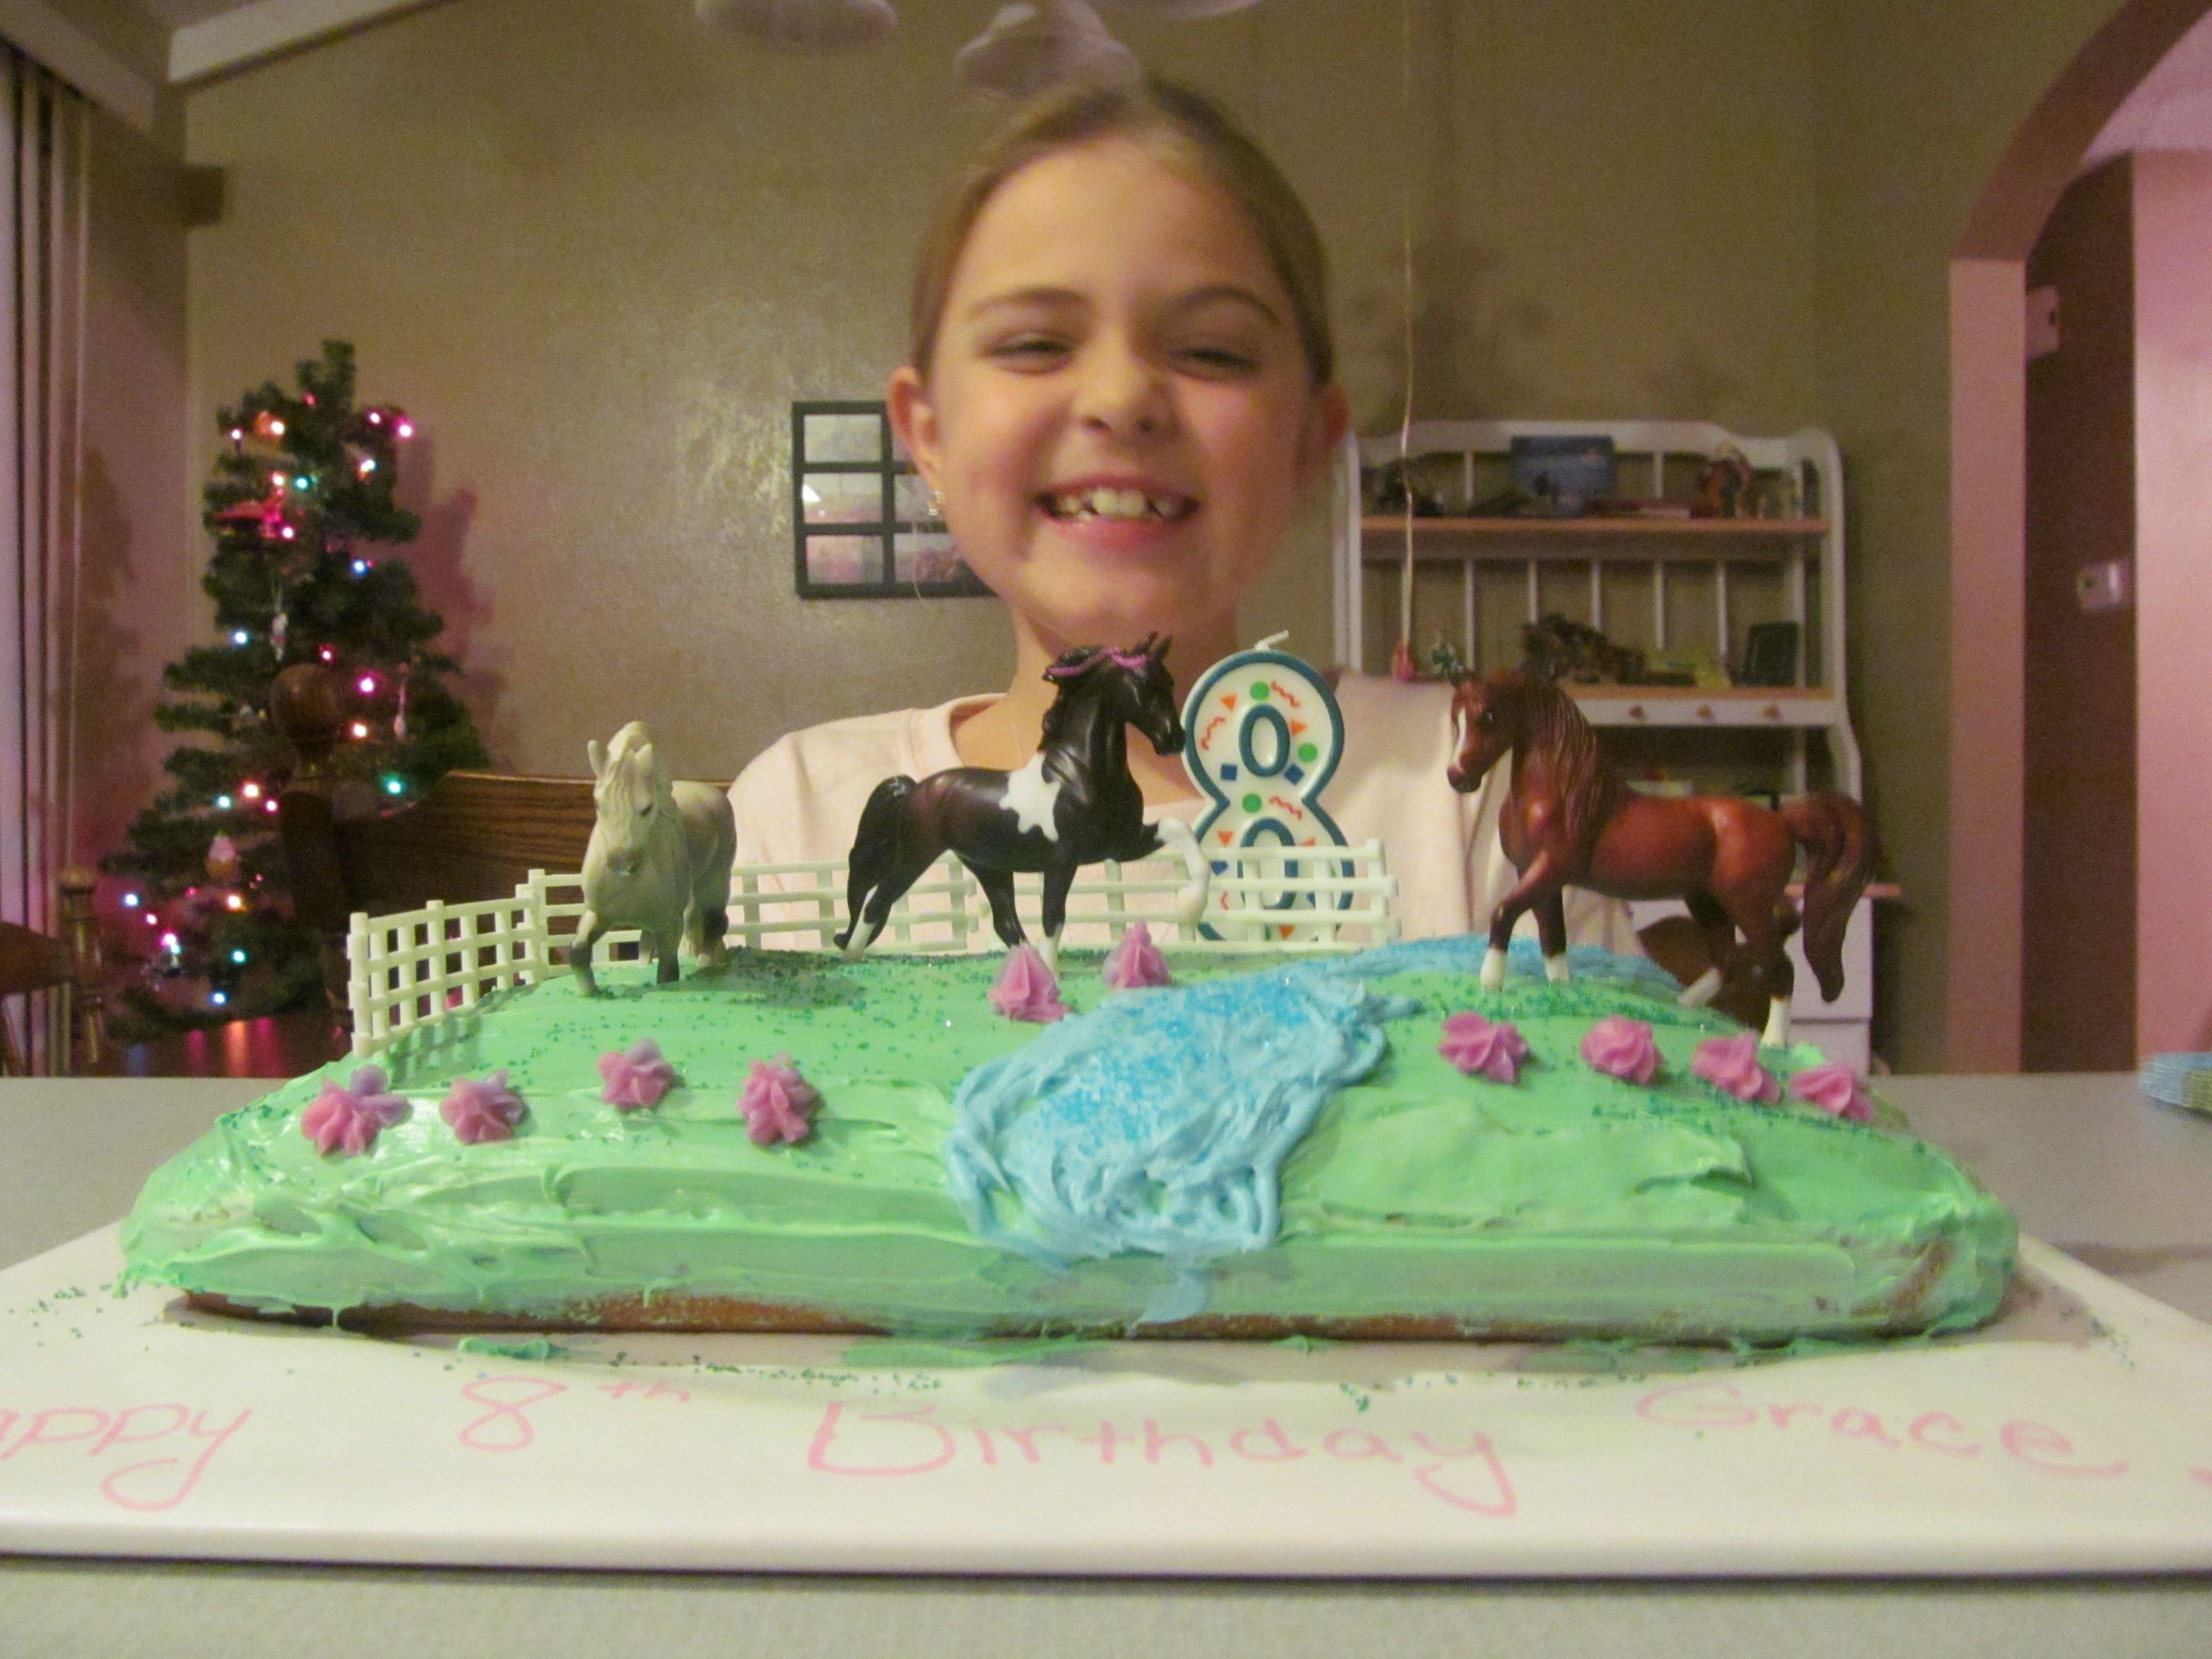 10 Stylish Horse Themed Birthday Party Ideas how to have a horse themed birthday party for an elementary aged 2020